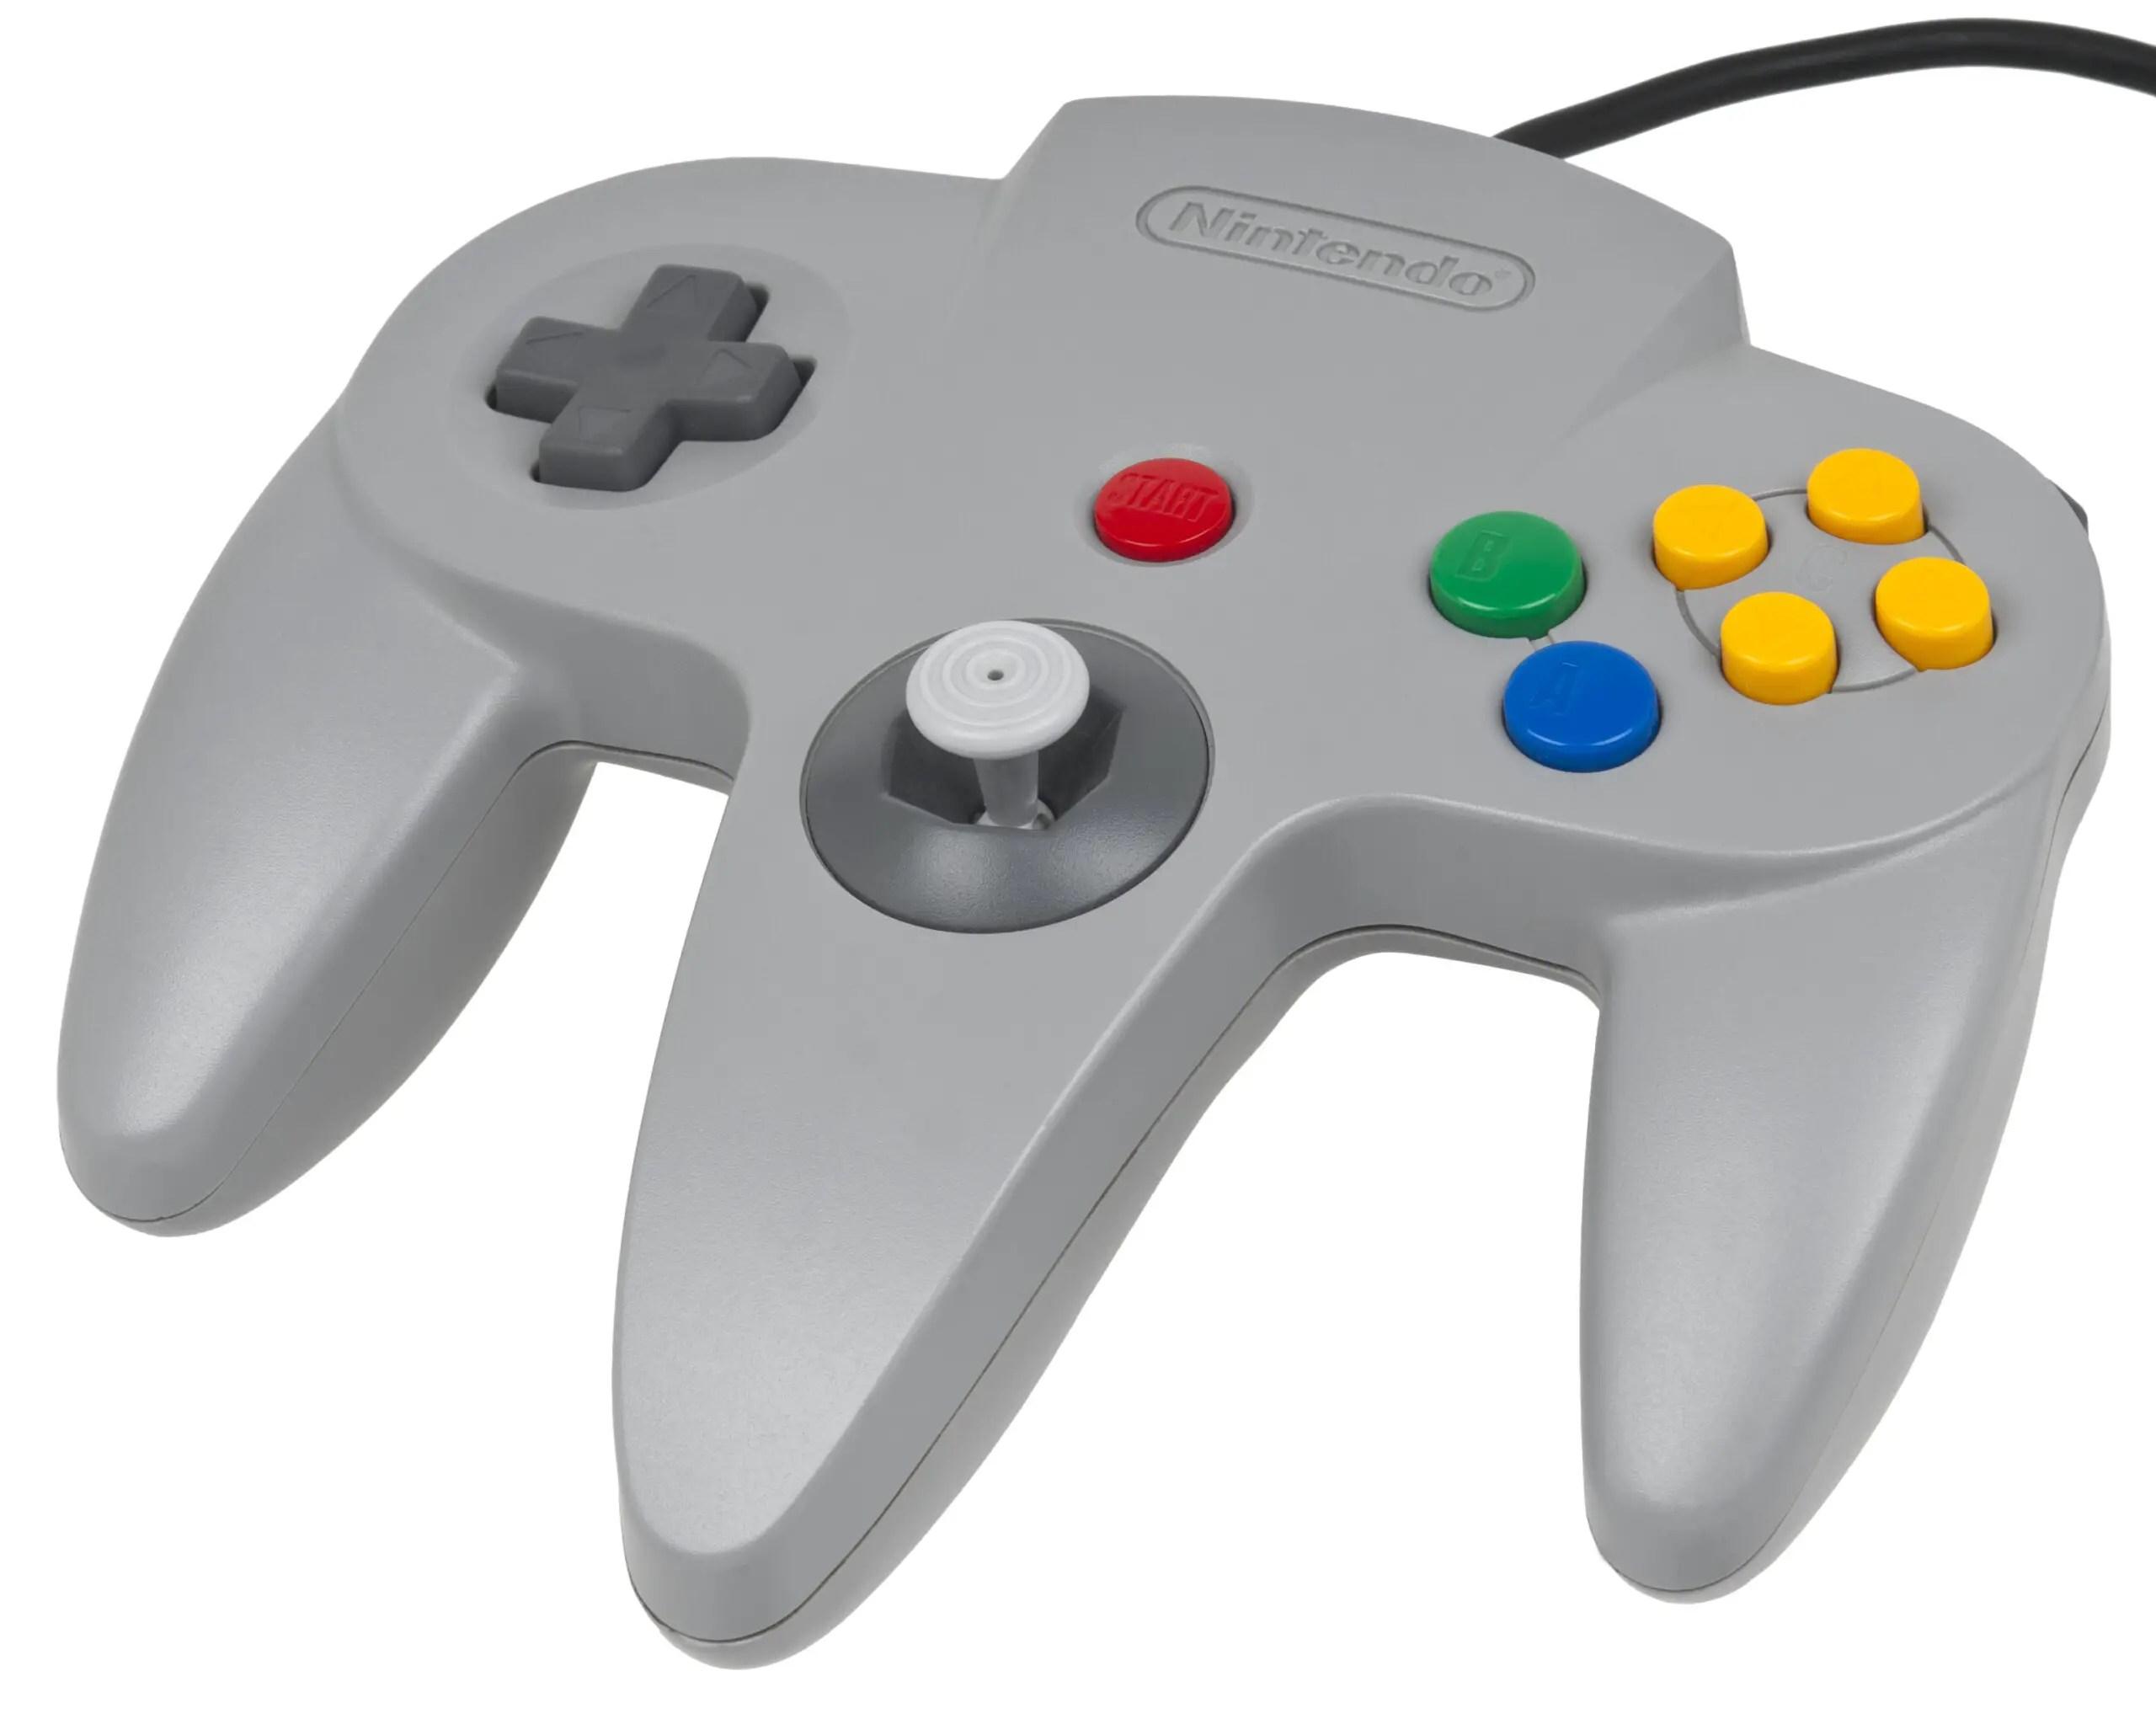 Nintendo N64 game controller